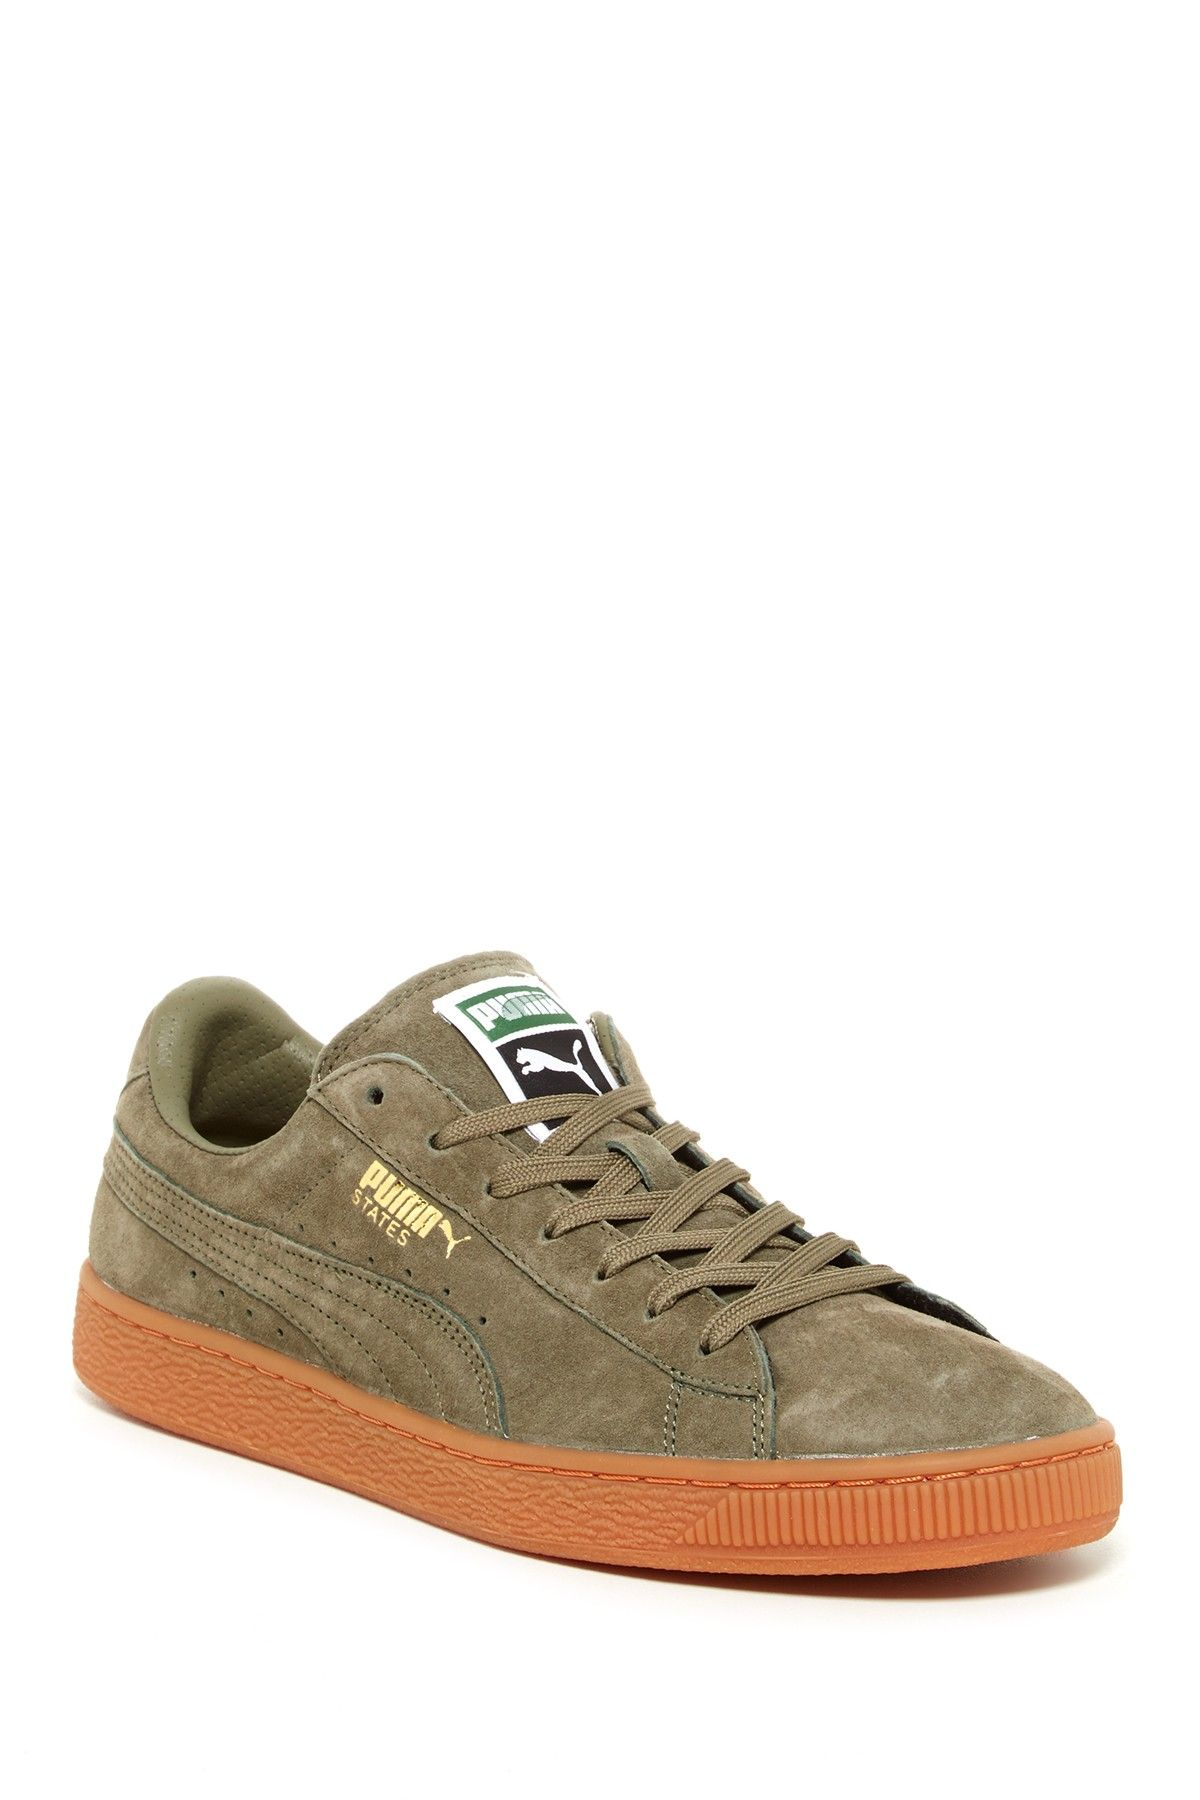 puma chaussure gum pack